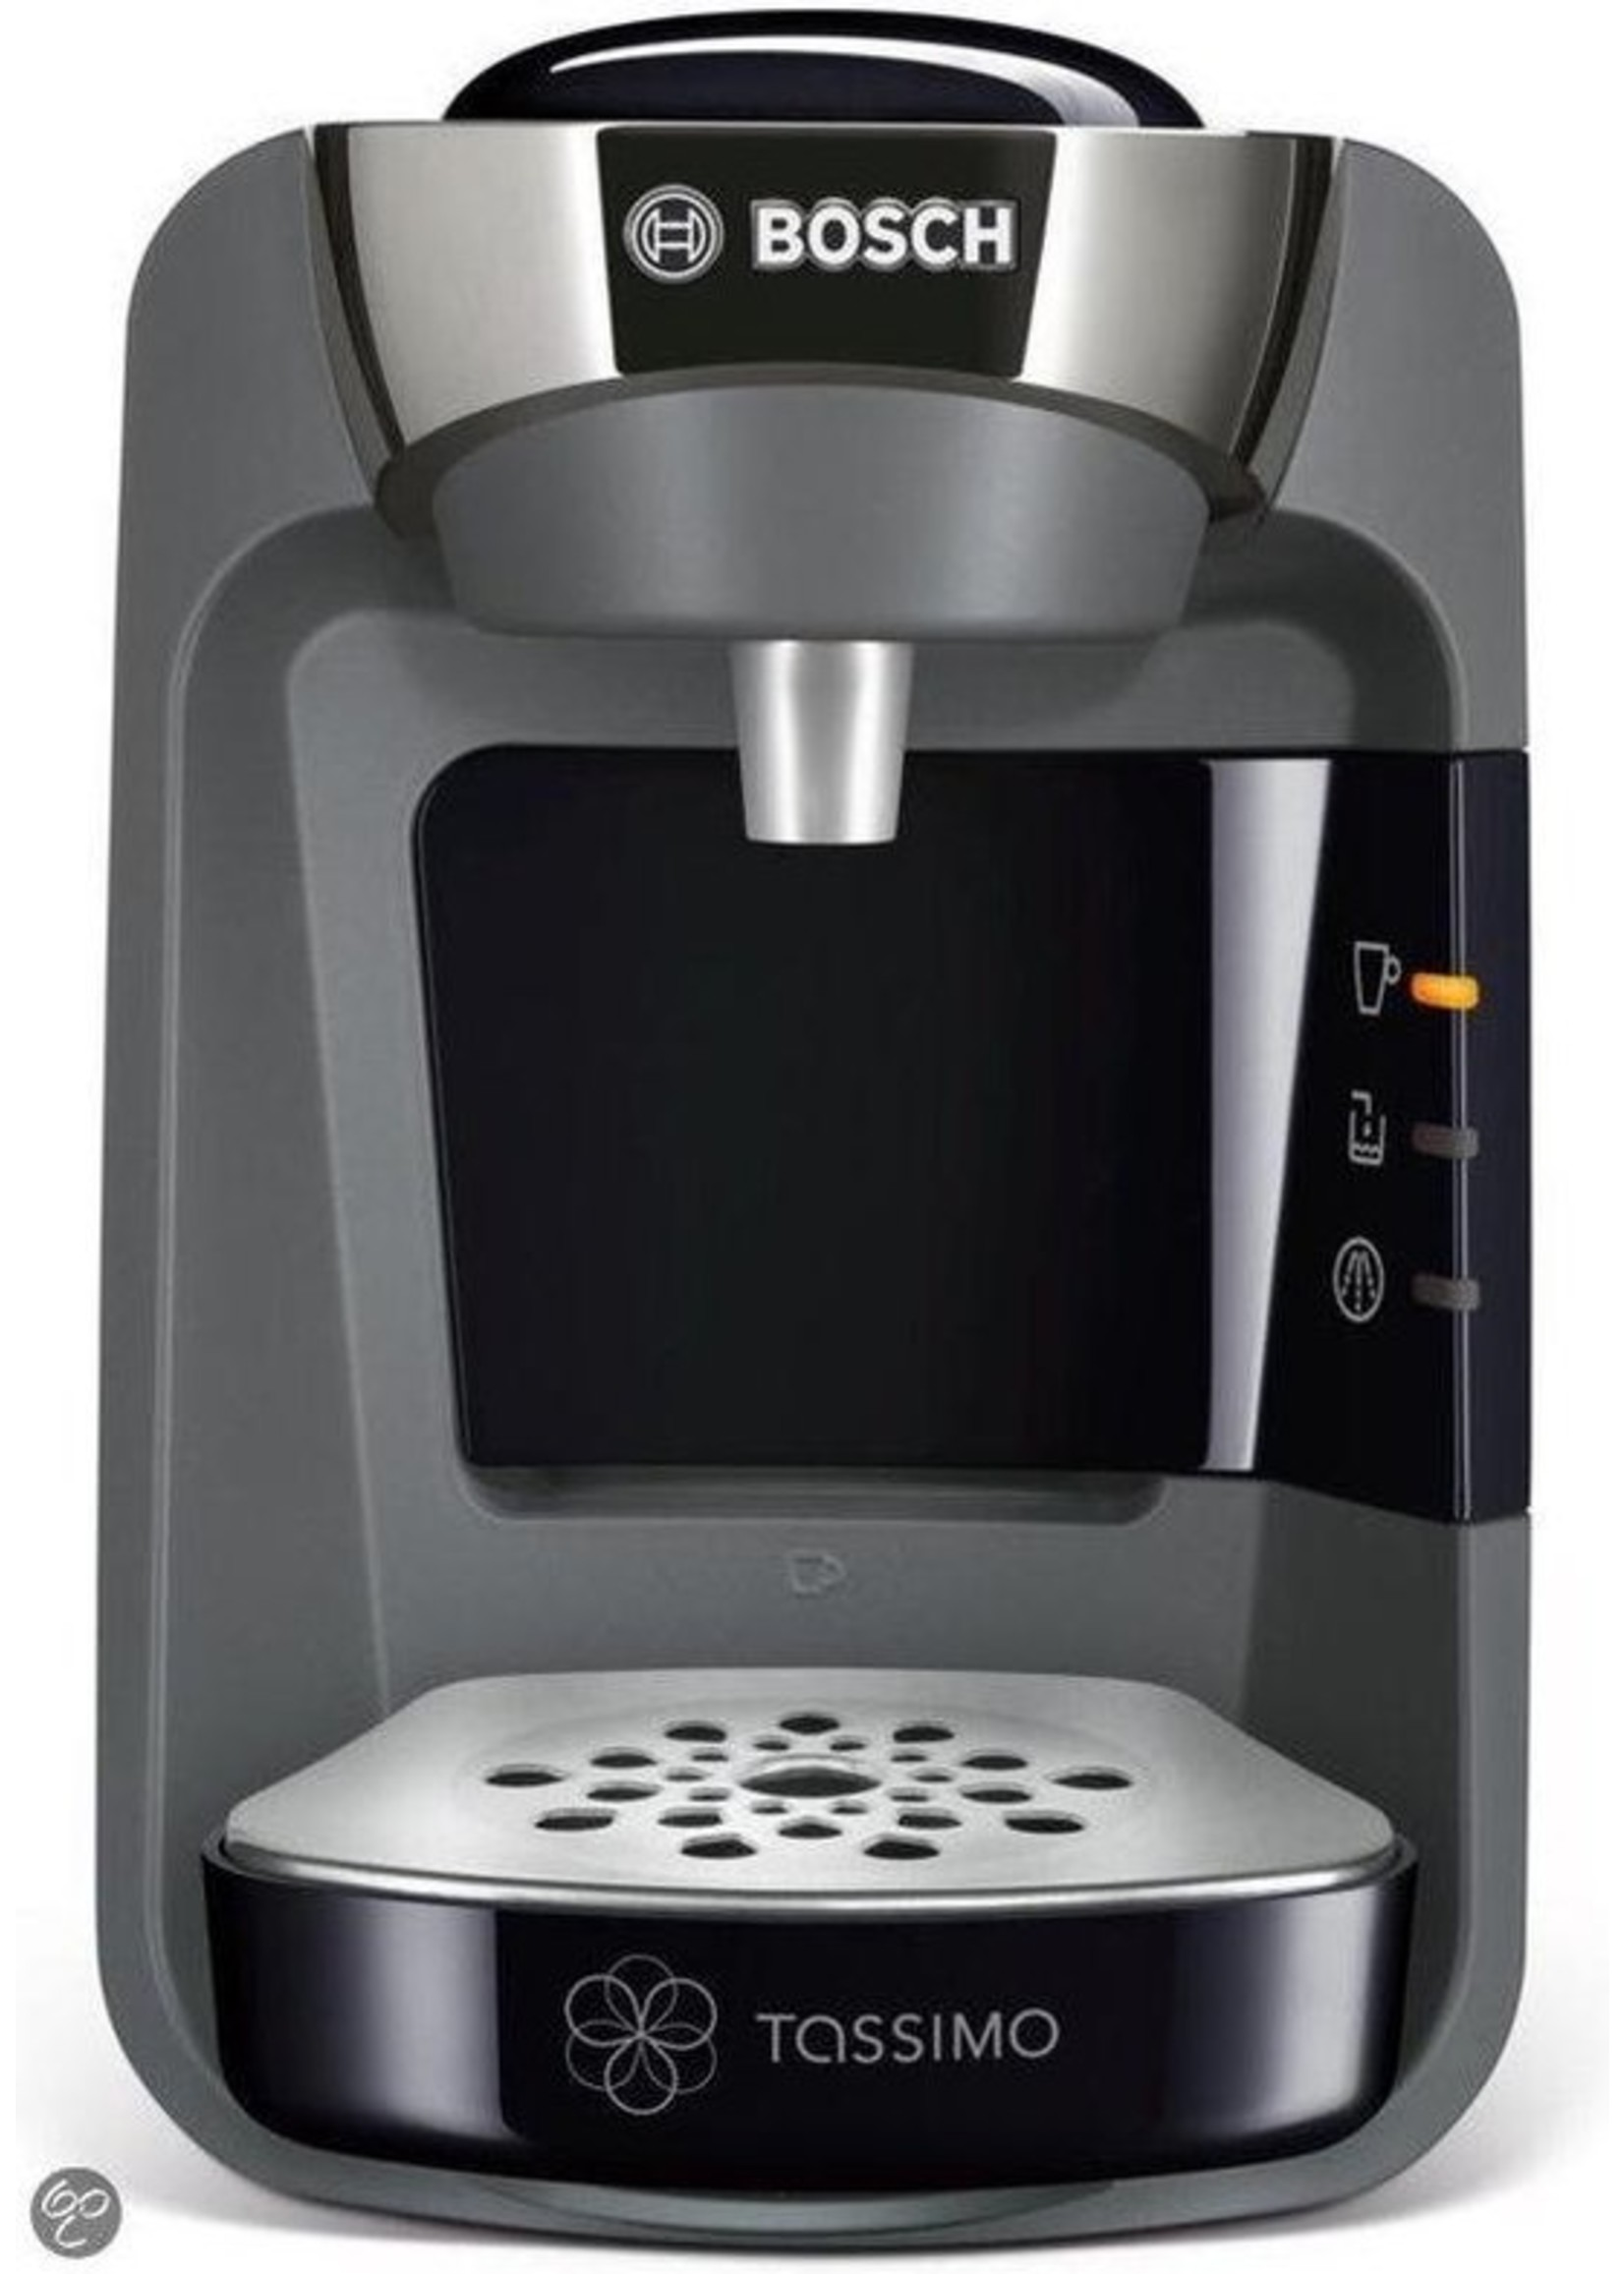 Bosch Bosch TAS3202 - Koffiepadmachine - Zwart koopjeshoek